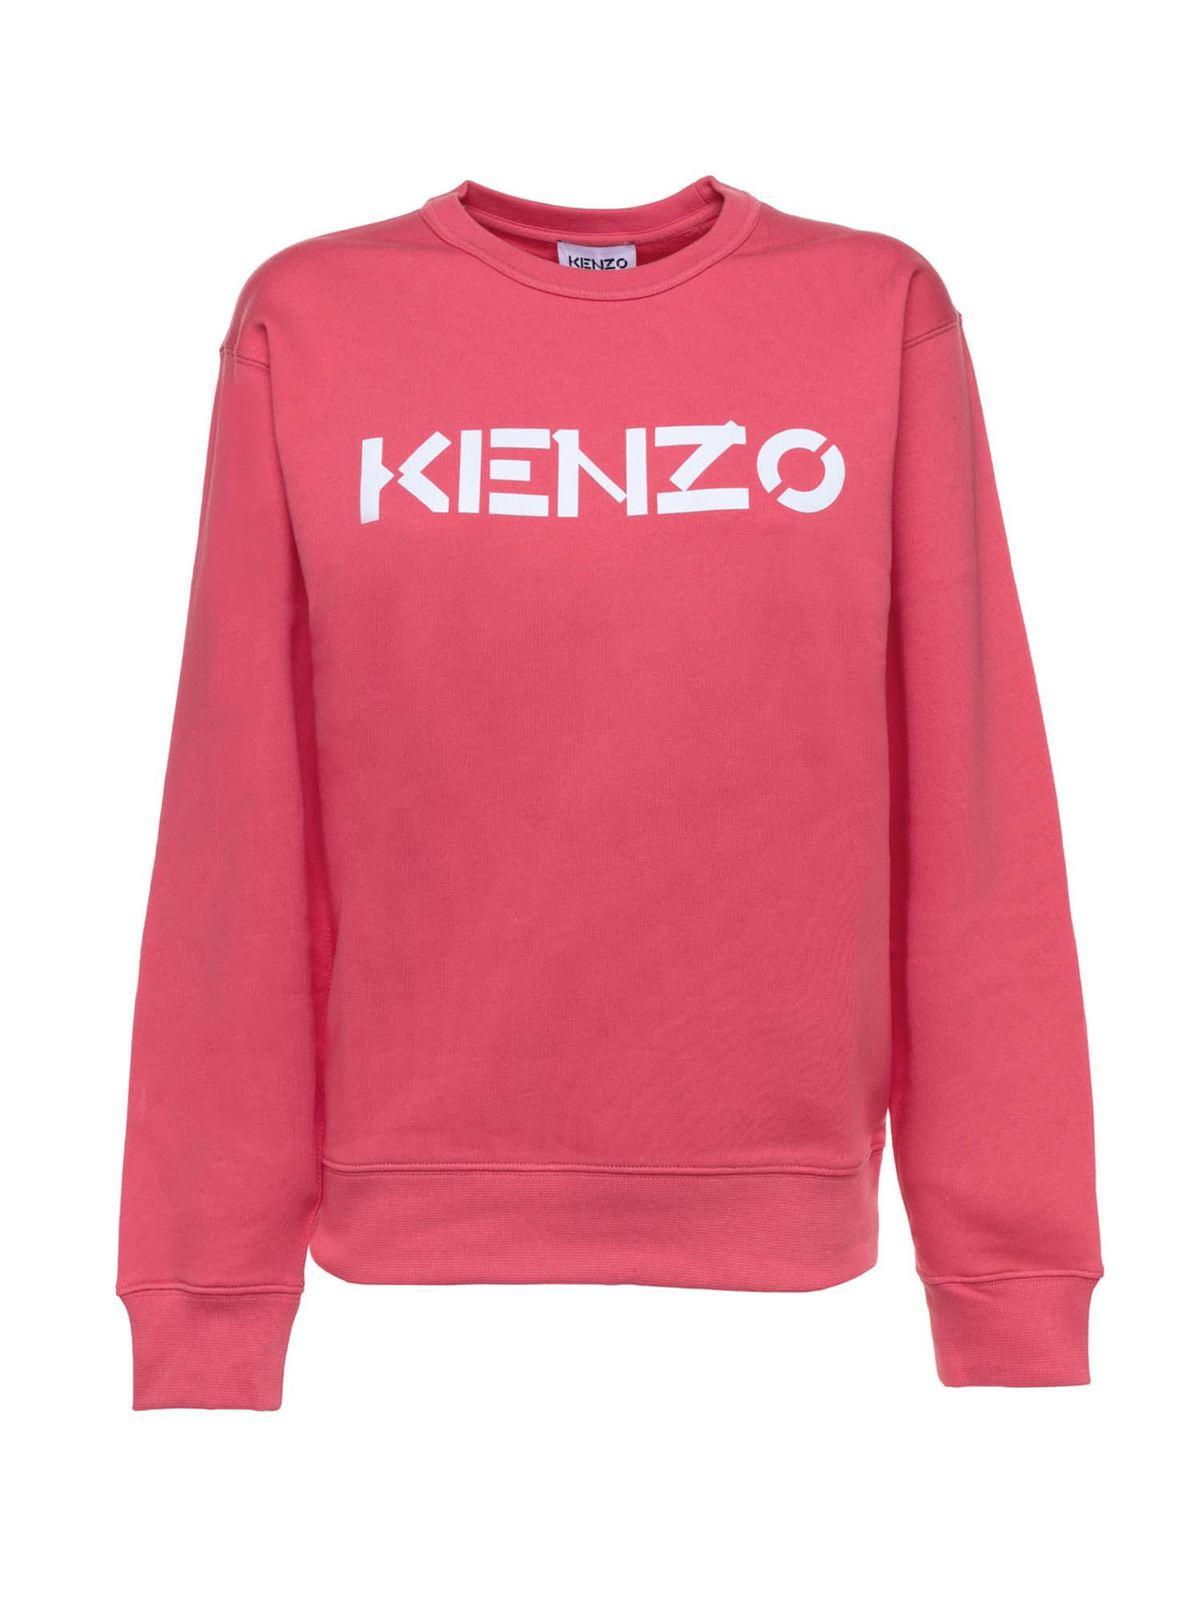 Kenzo LETTERING SWEATSHIRT IN TANGERINE